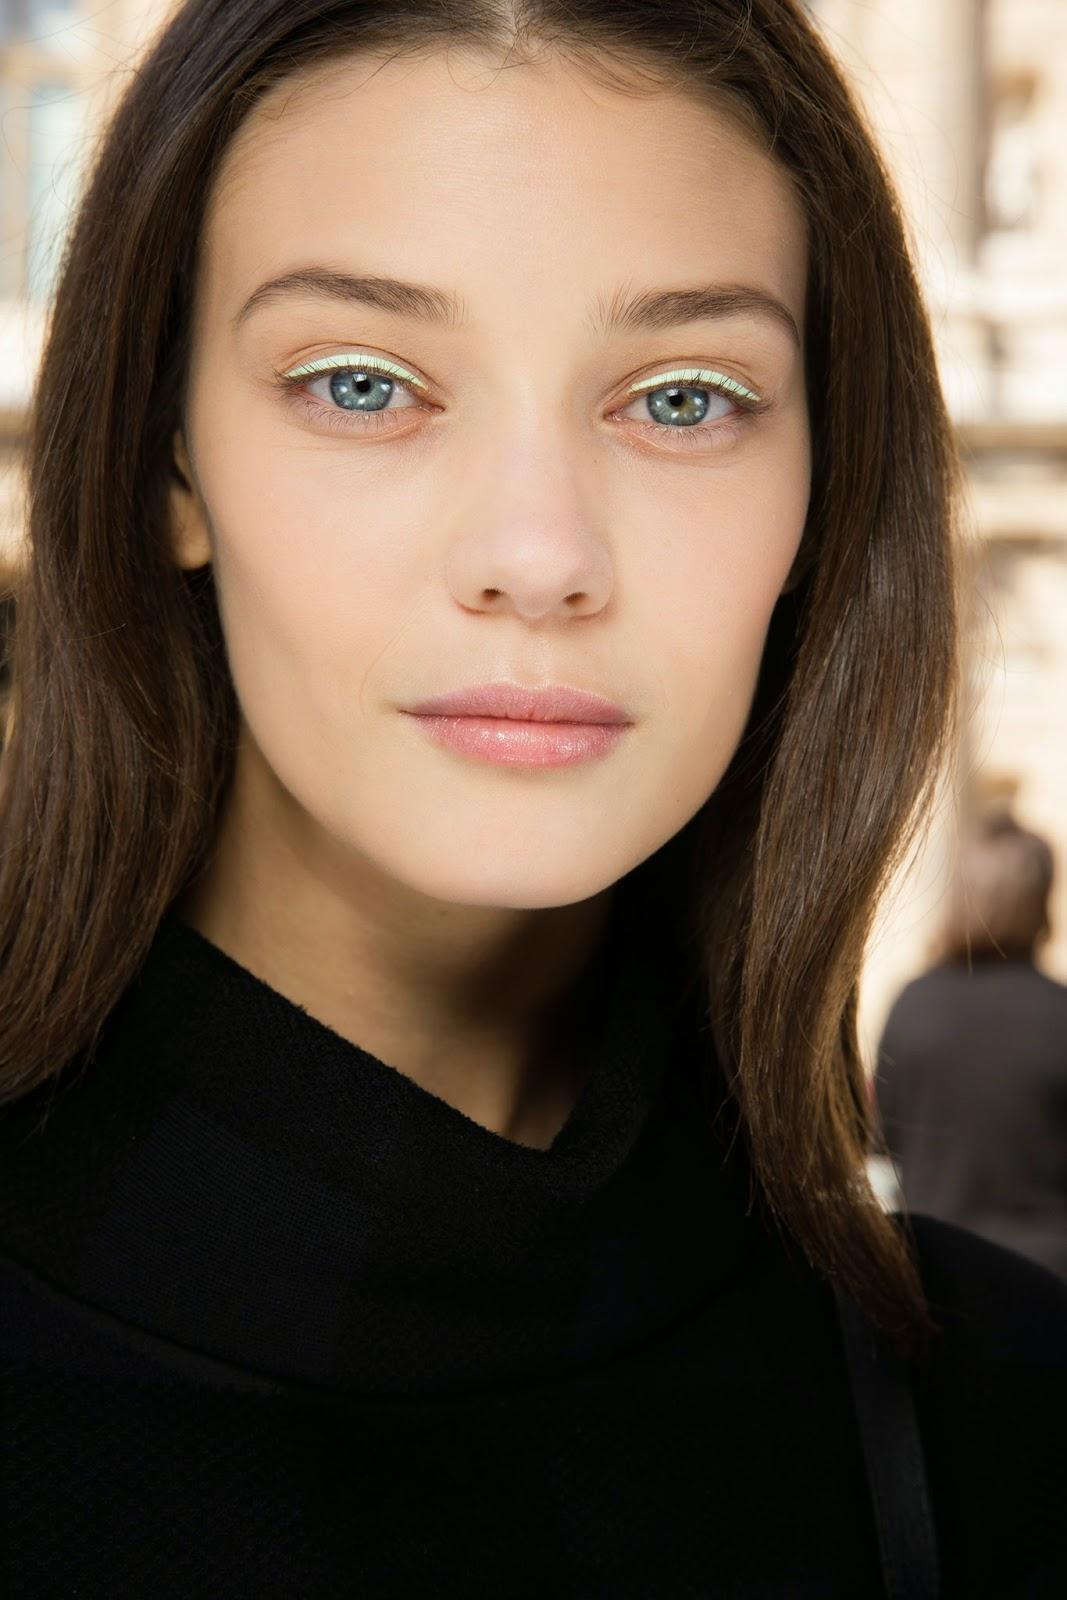 Delineador - Eyeliner adesivo em cetim da Dior  - Tendência  primavera 2015